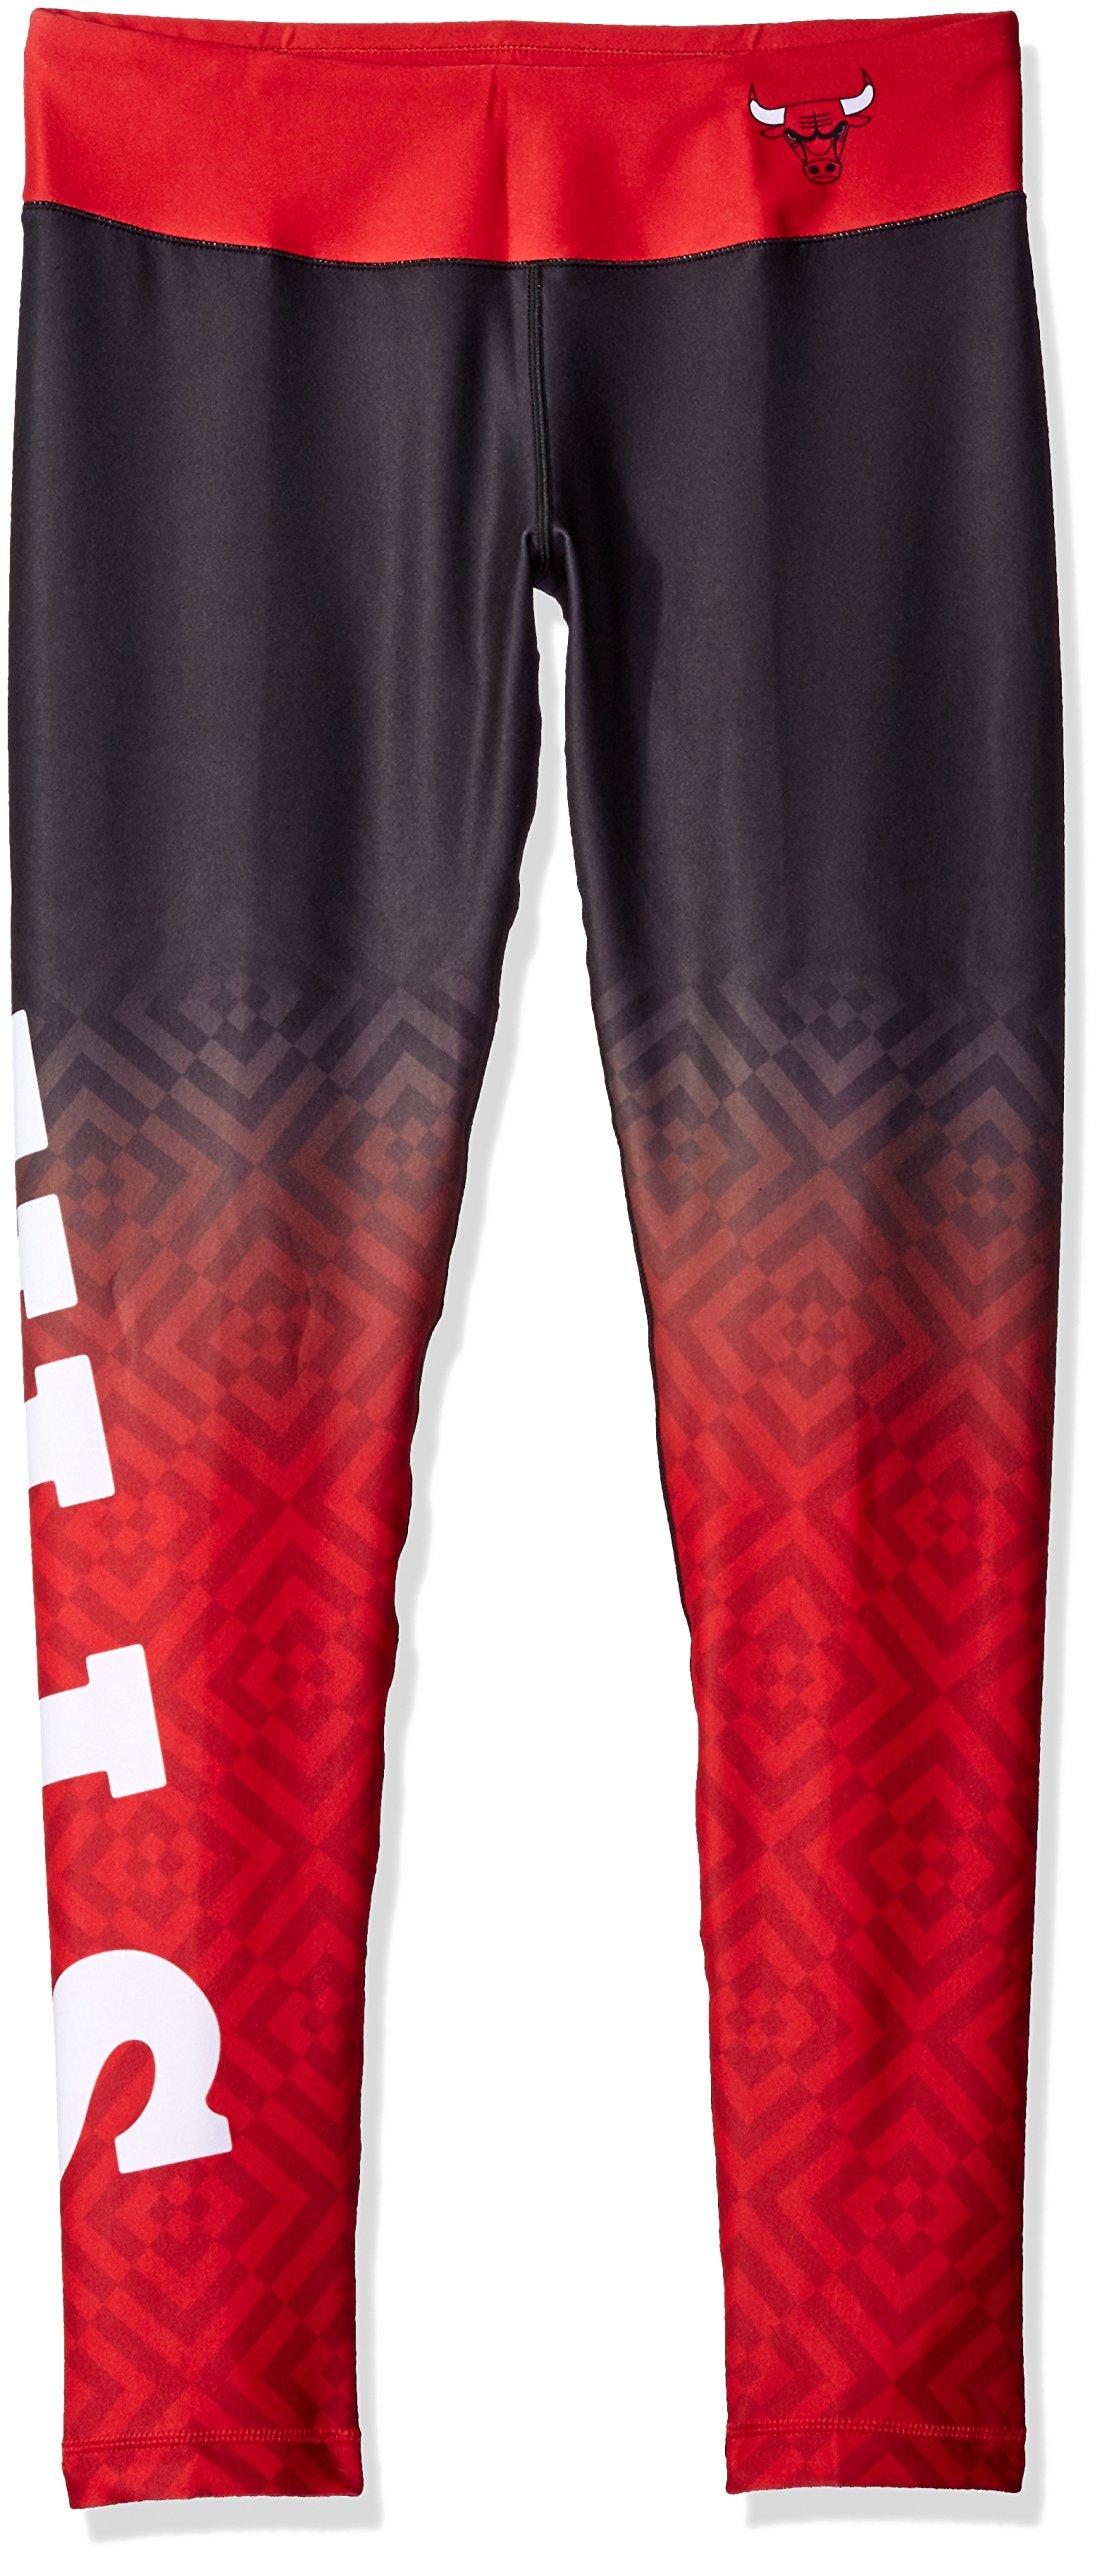 FOCO Chicago Bulls Gradient Print Legging - Womens Extra Large by FOCO